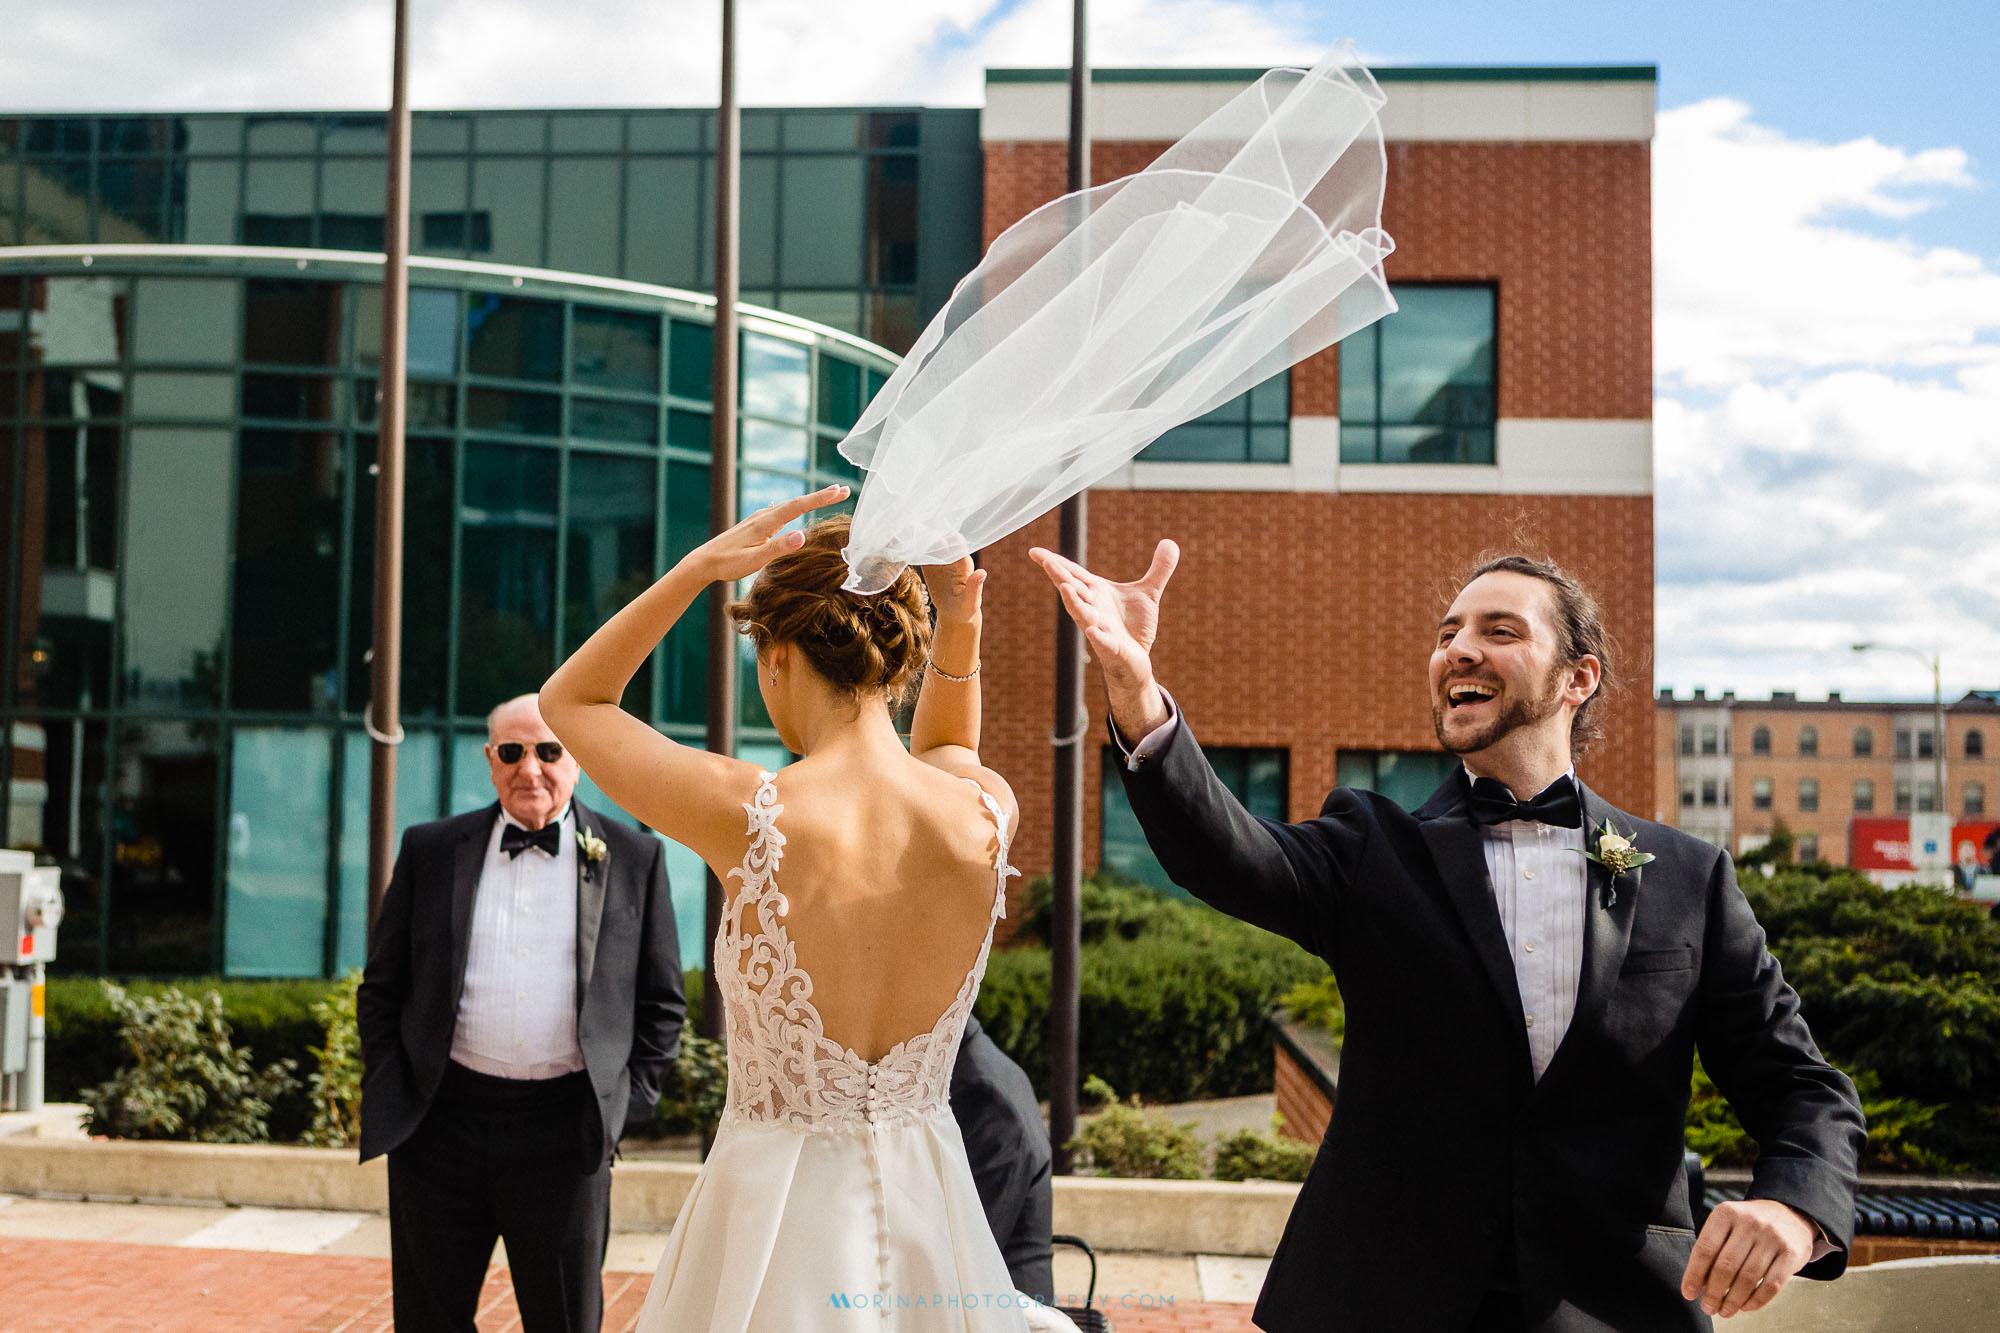 Ilhana & Jonathan Wedding at Vault 634 - Allentown 0049.jpg